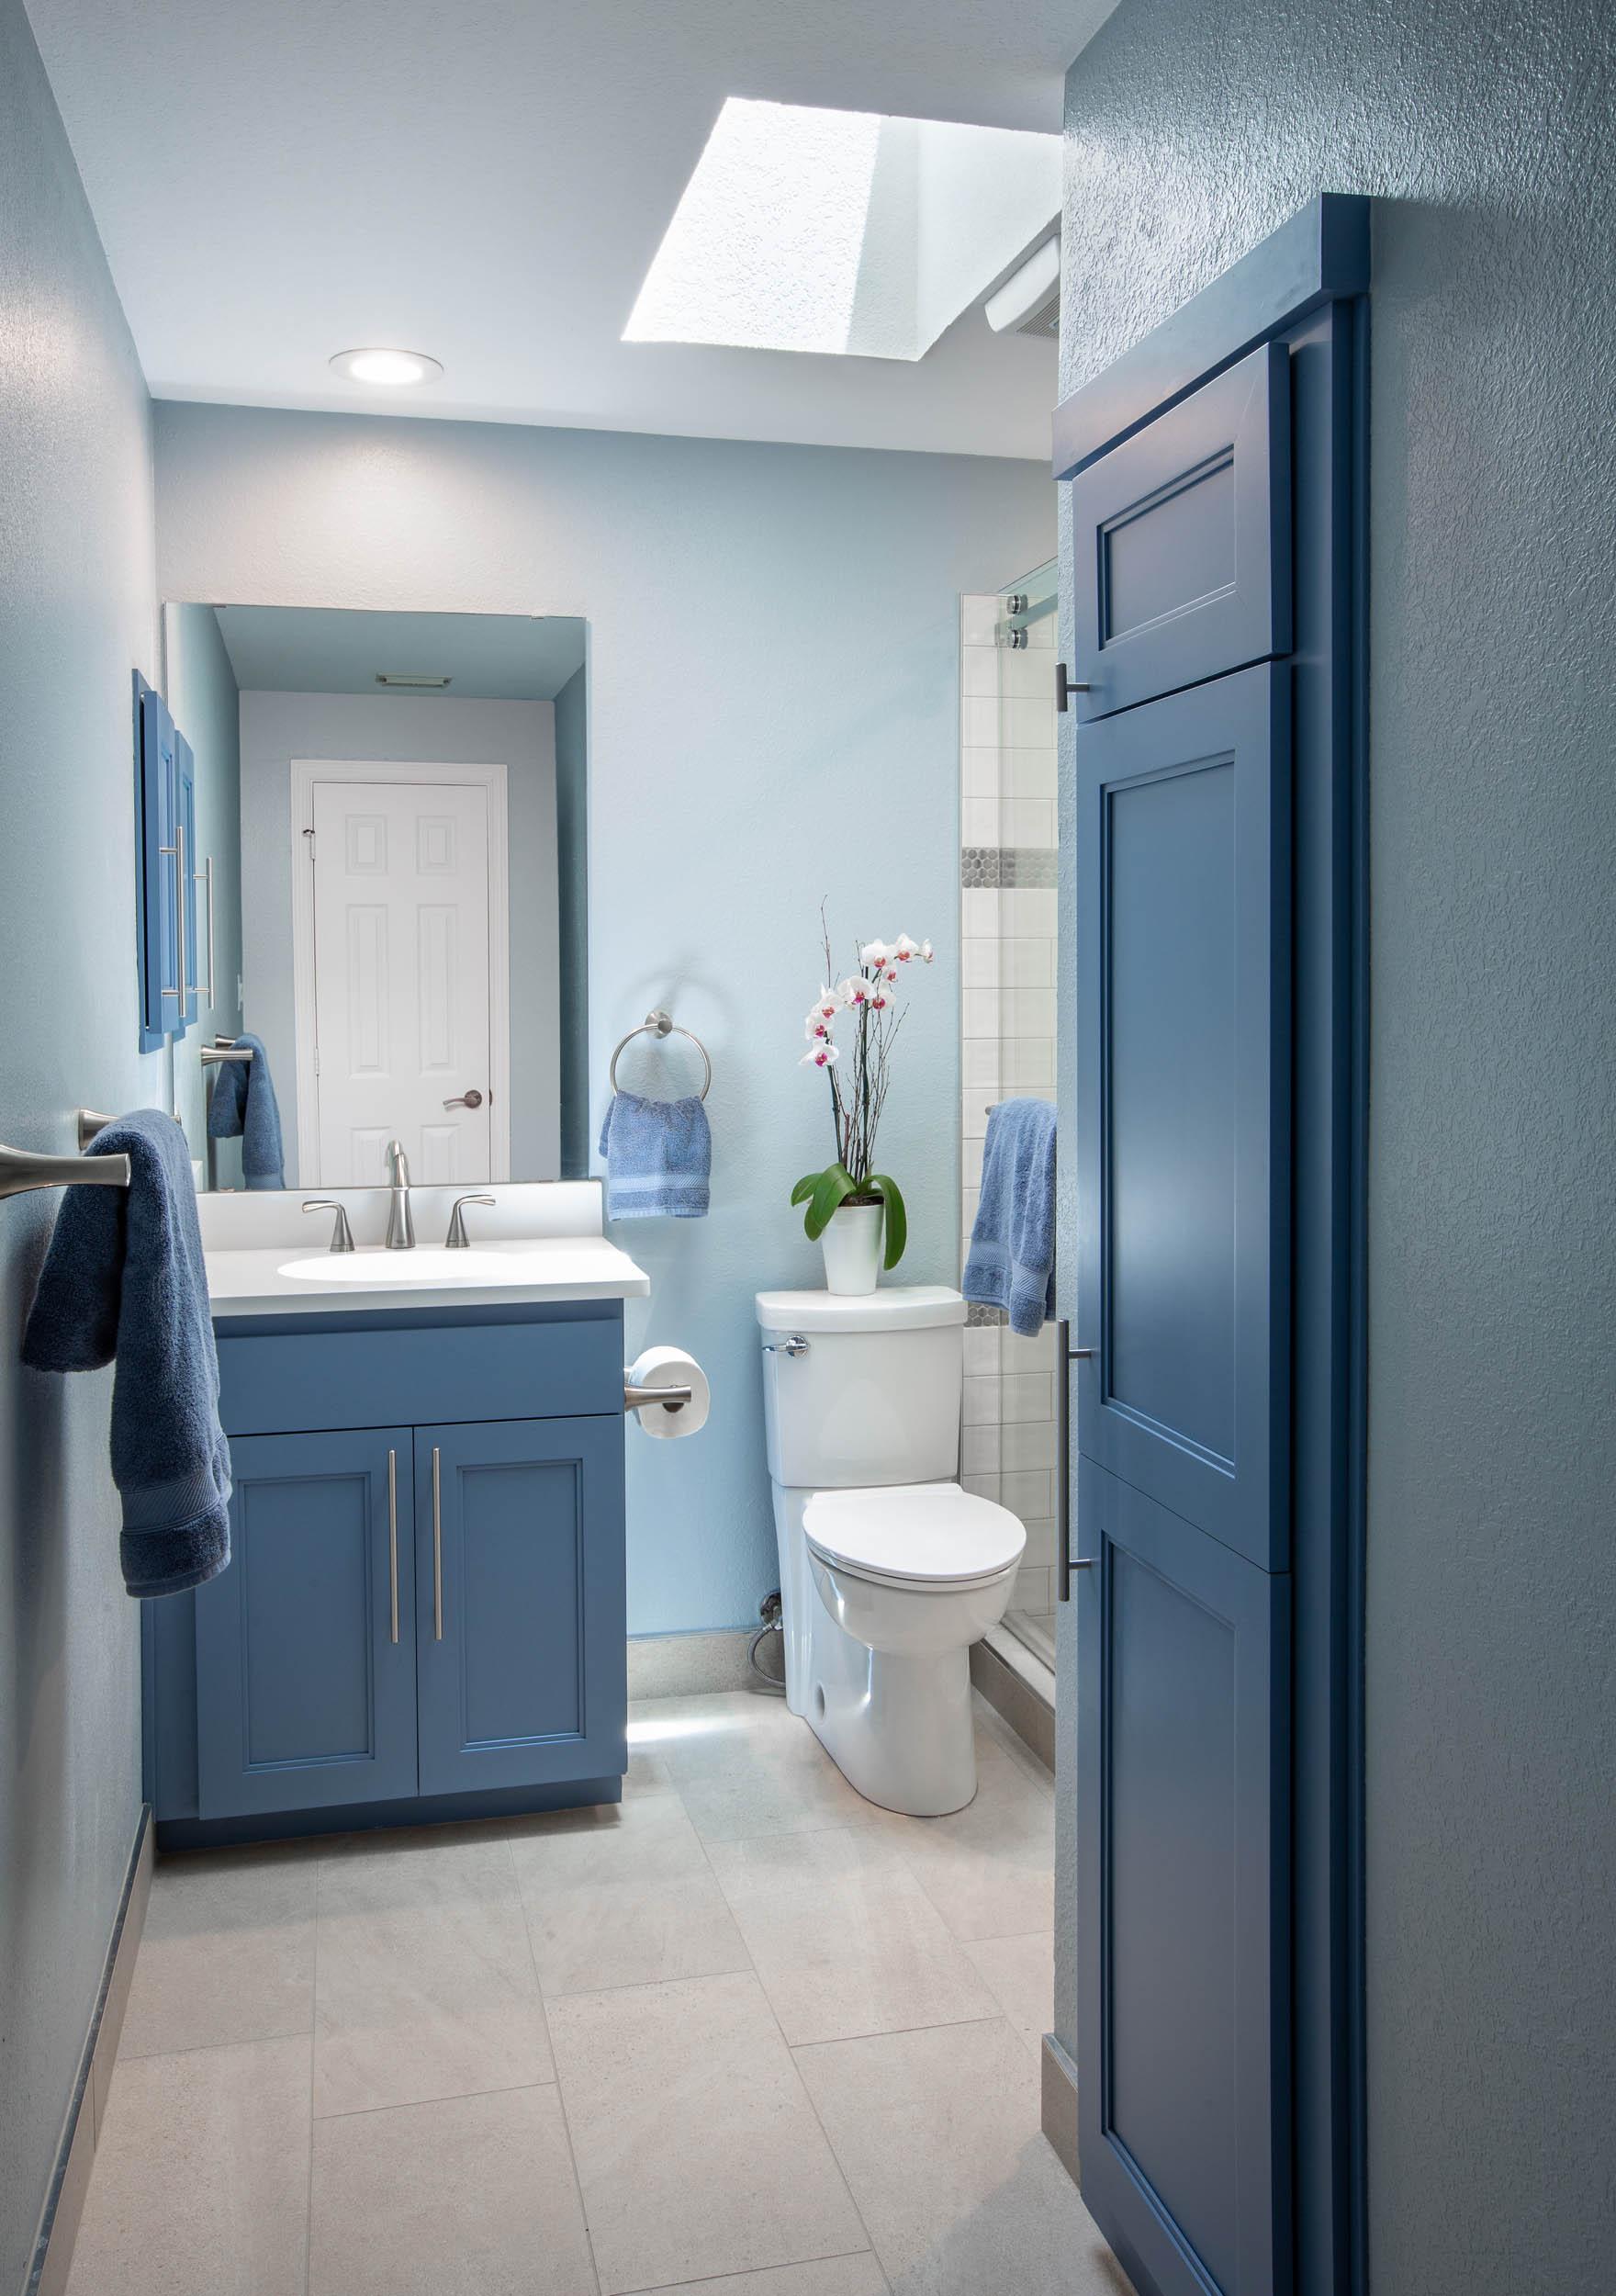 skylight lighting bathroom remodel trophy club tx